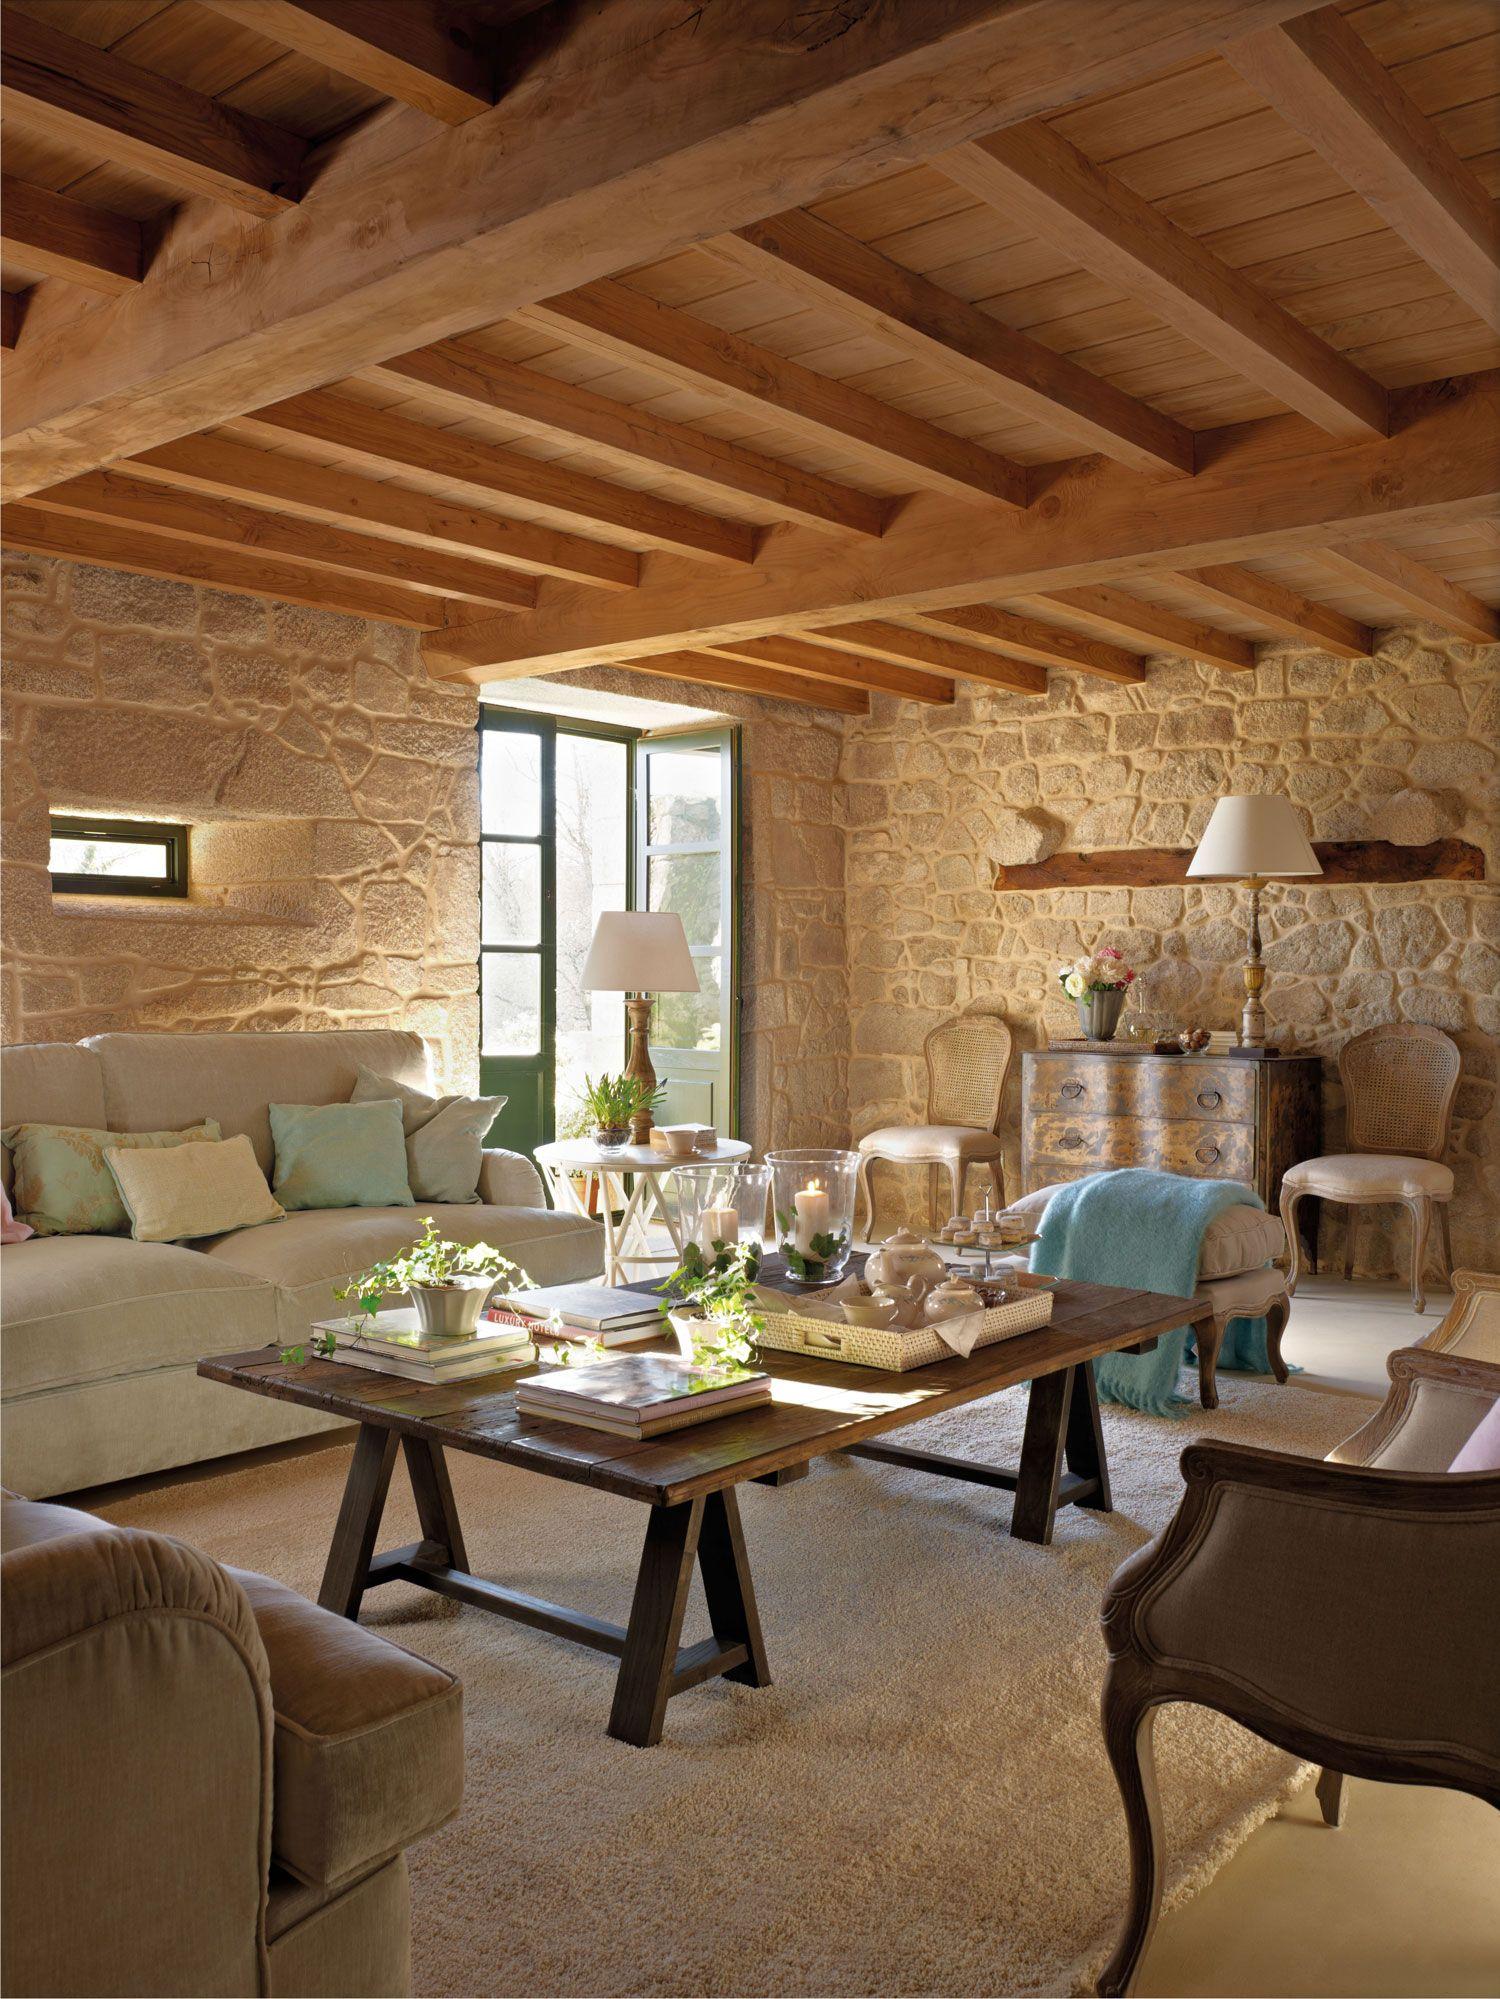 Solidez living room ideas pinterest casas r sticas - Ideas para casas rurales ...